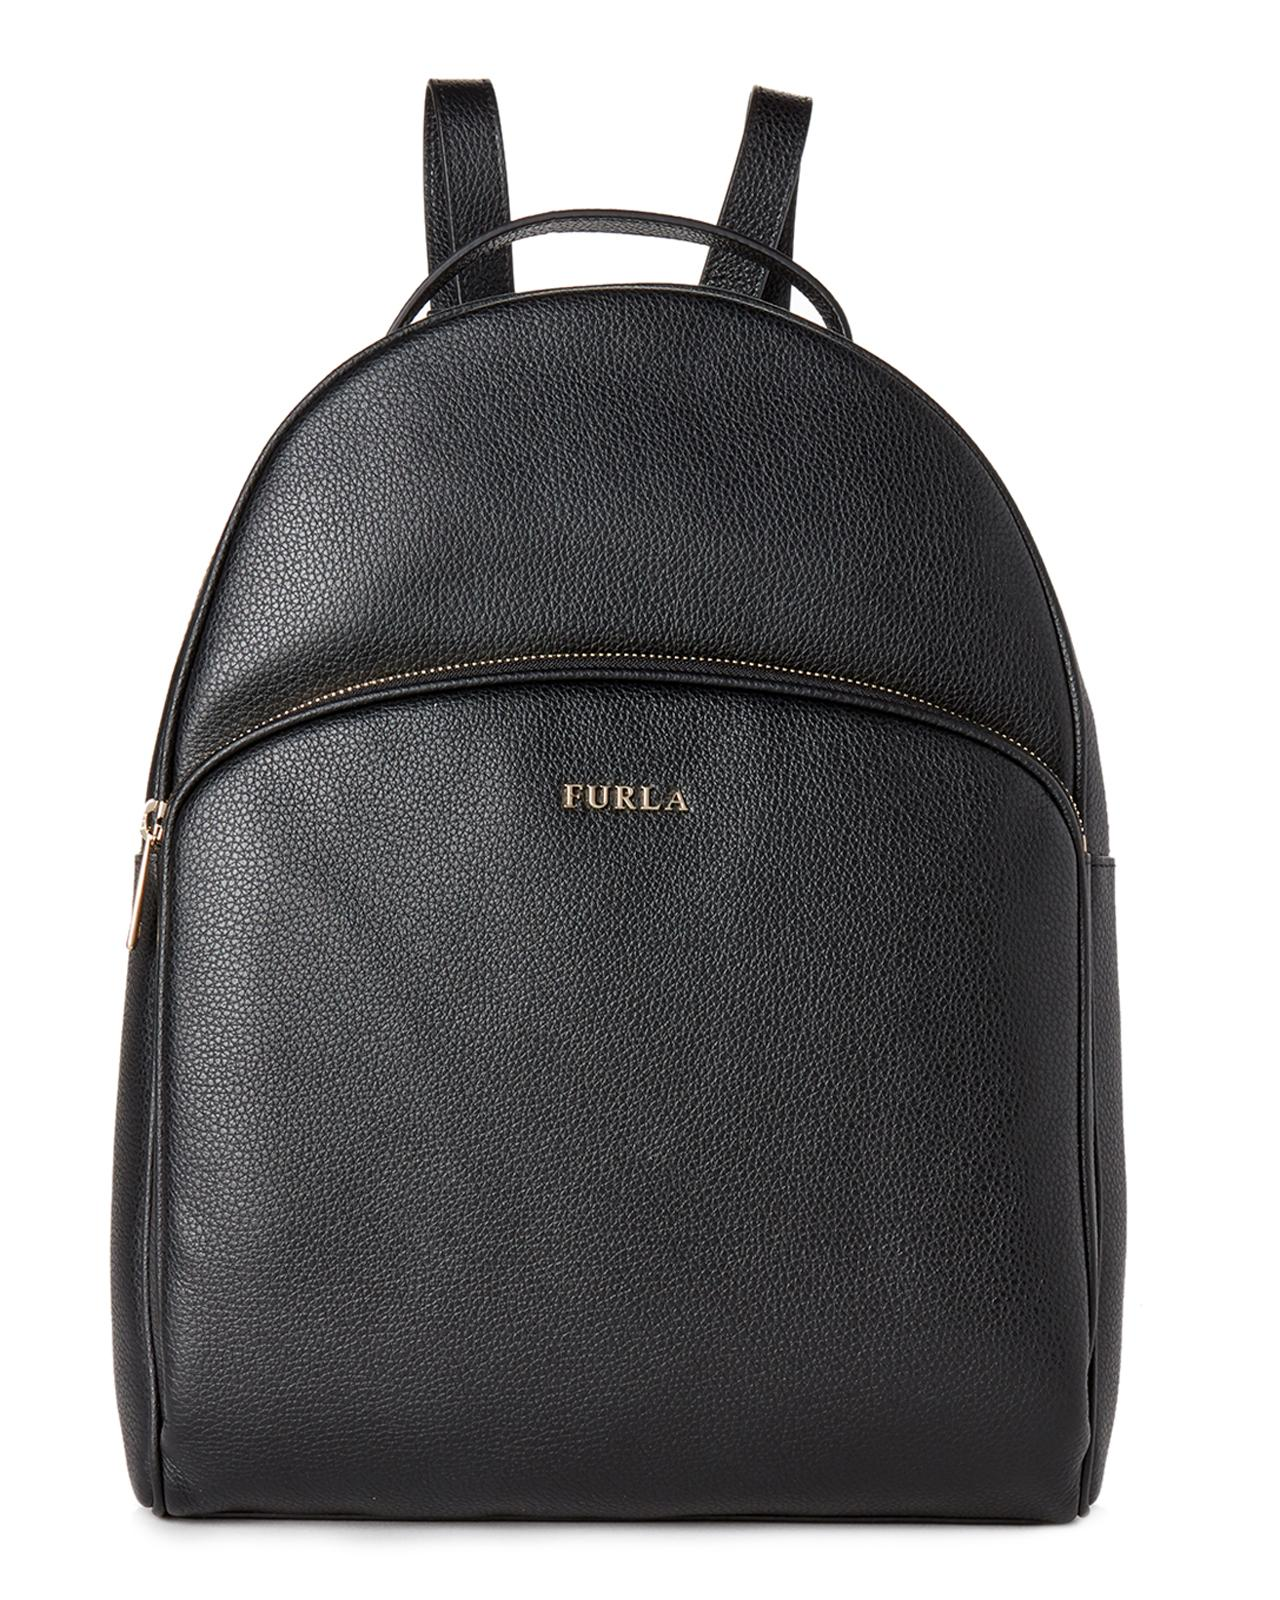 bc65592b63f8 Lyst - Furla Onyx Frida Leather Backpack in Black